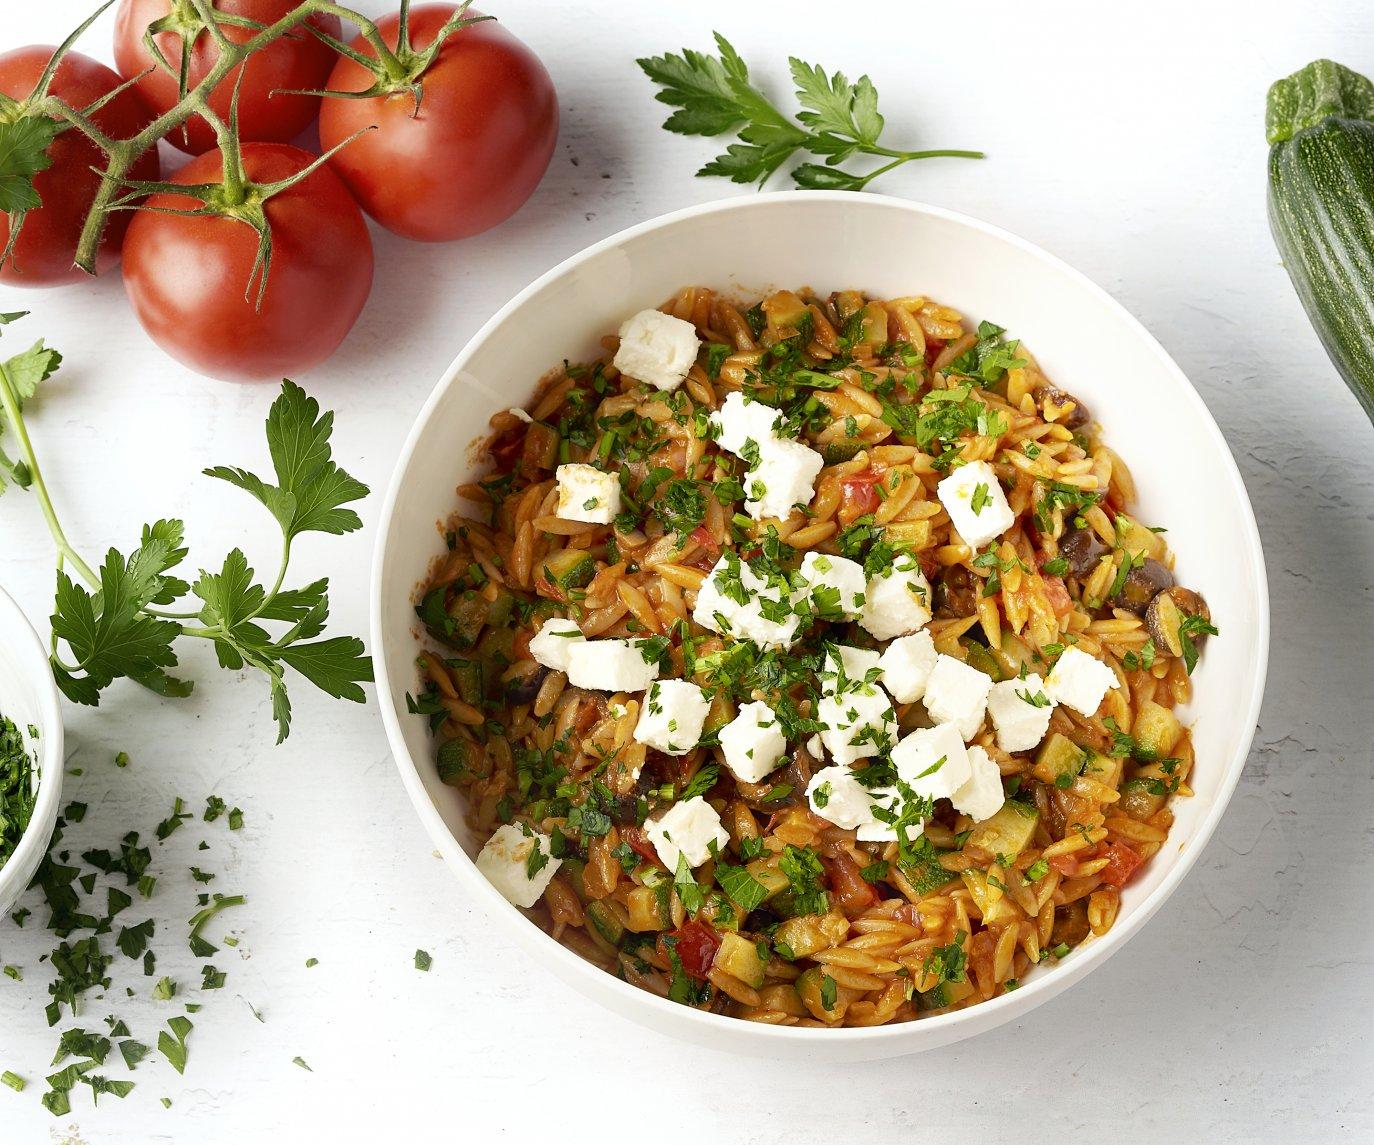 Griekse risotto van orzo met tomaat en feta